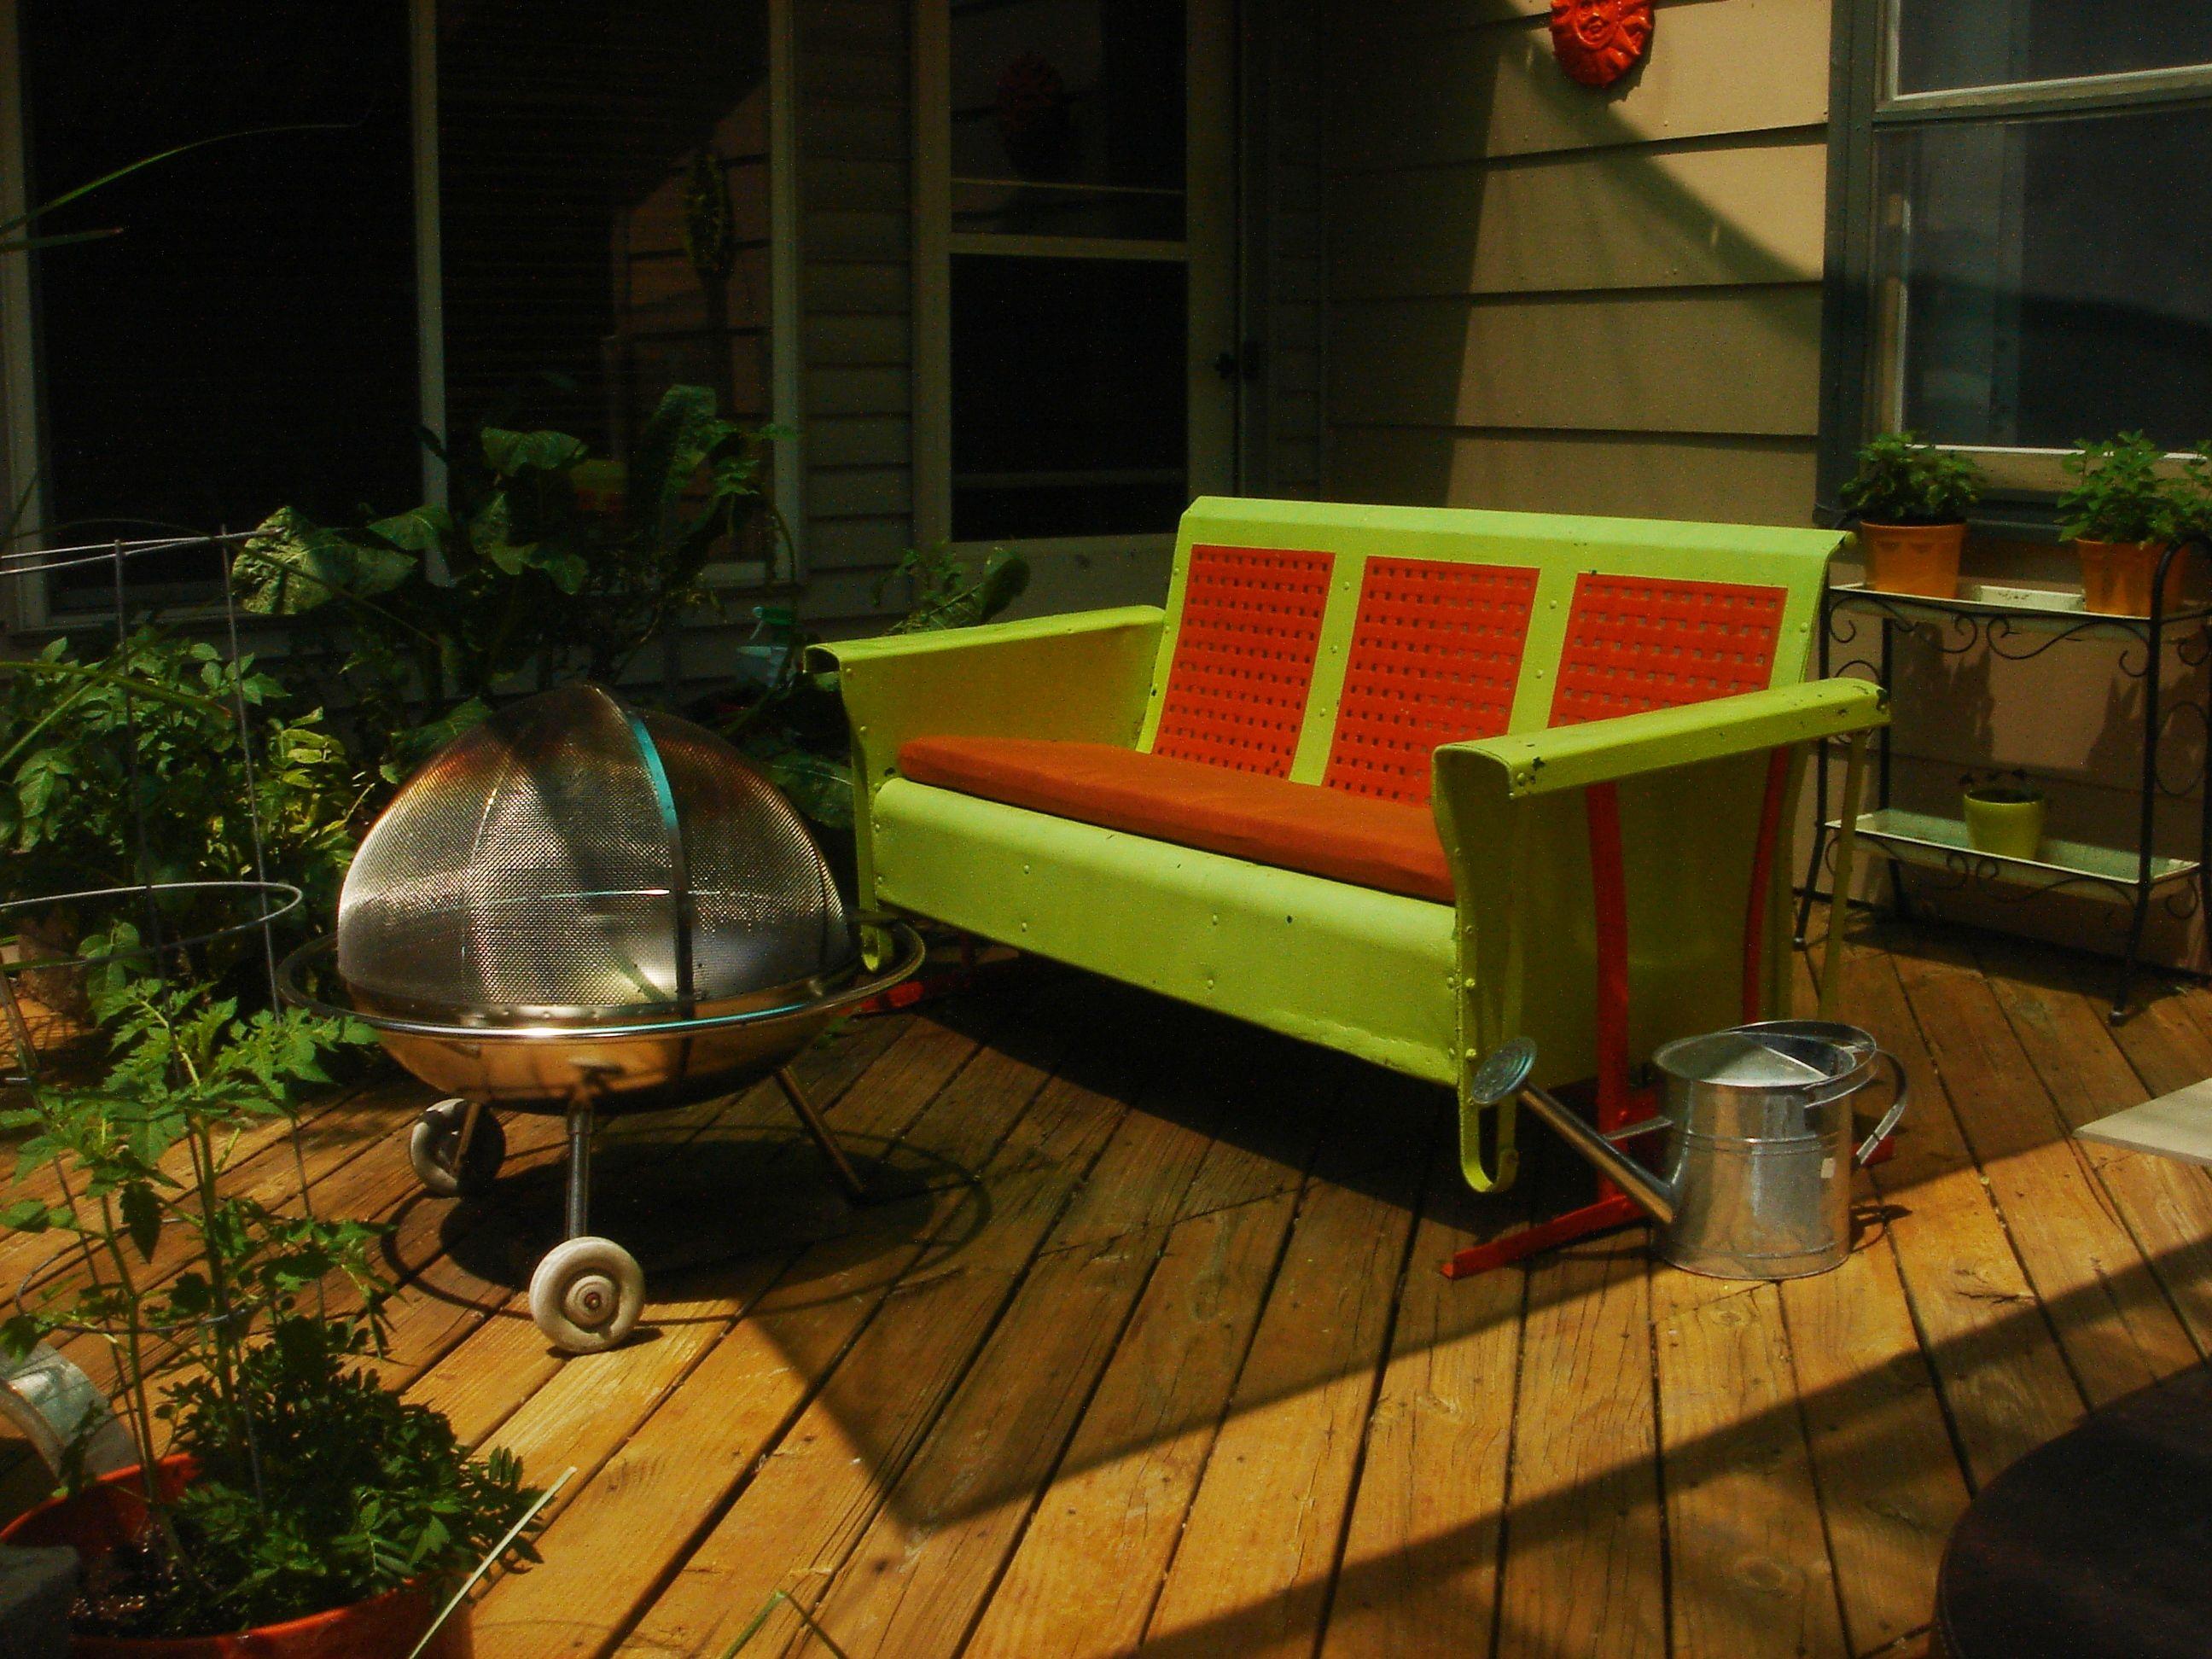 106 photos of readers\' retro patios, porches, decks, sunrooms